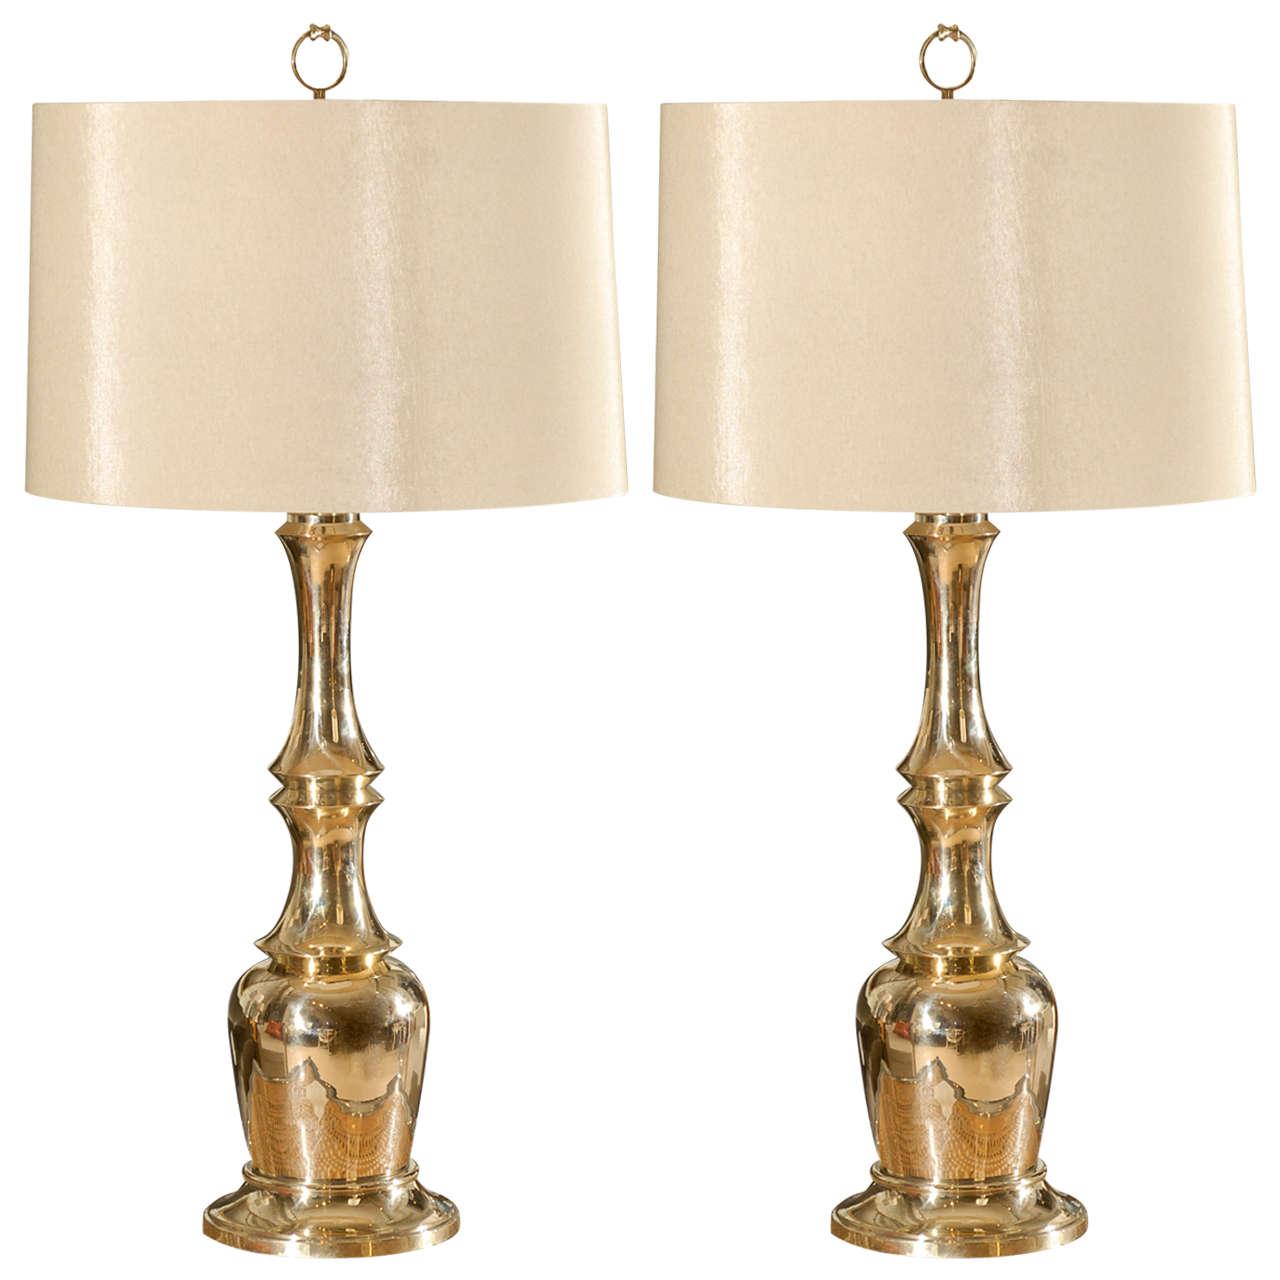 Great Pair of Brass Faux Bamboo Lamps by Warren Kessler